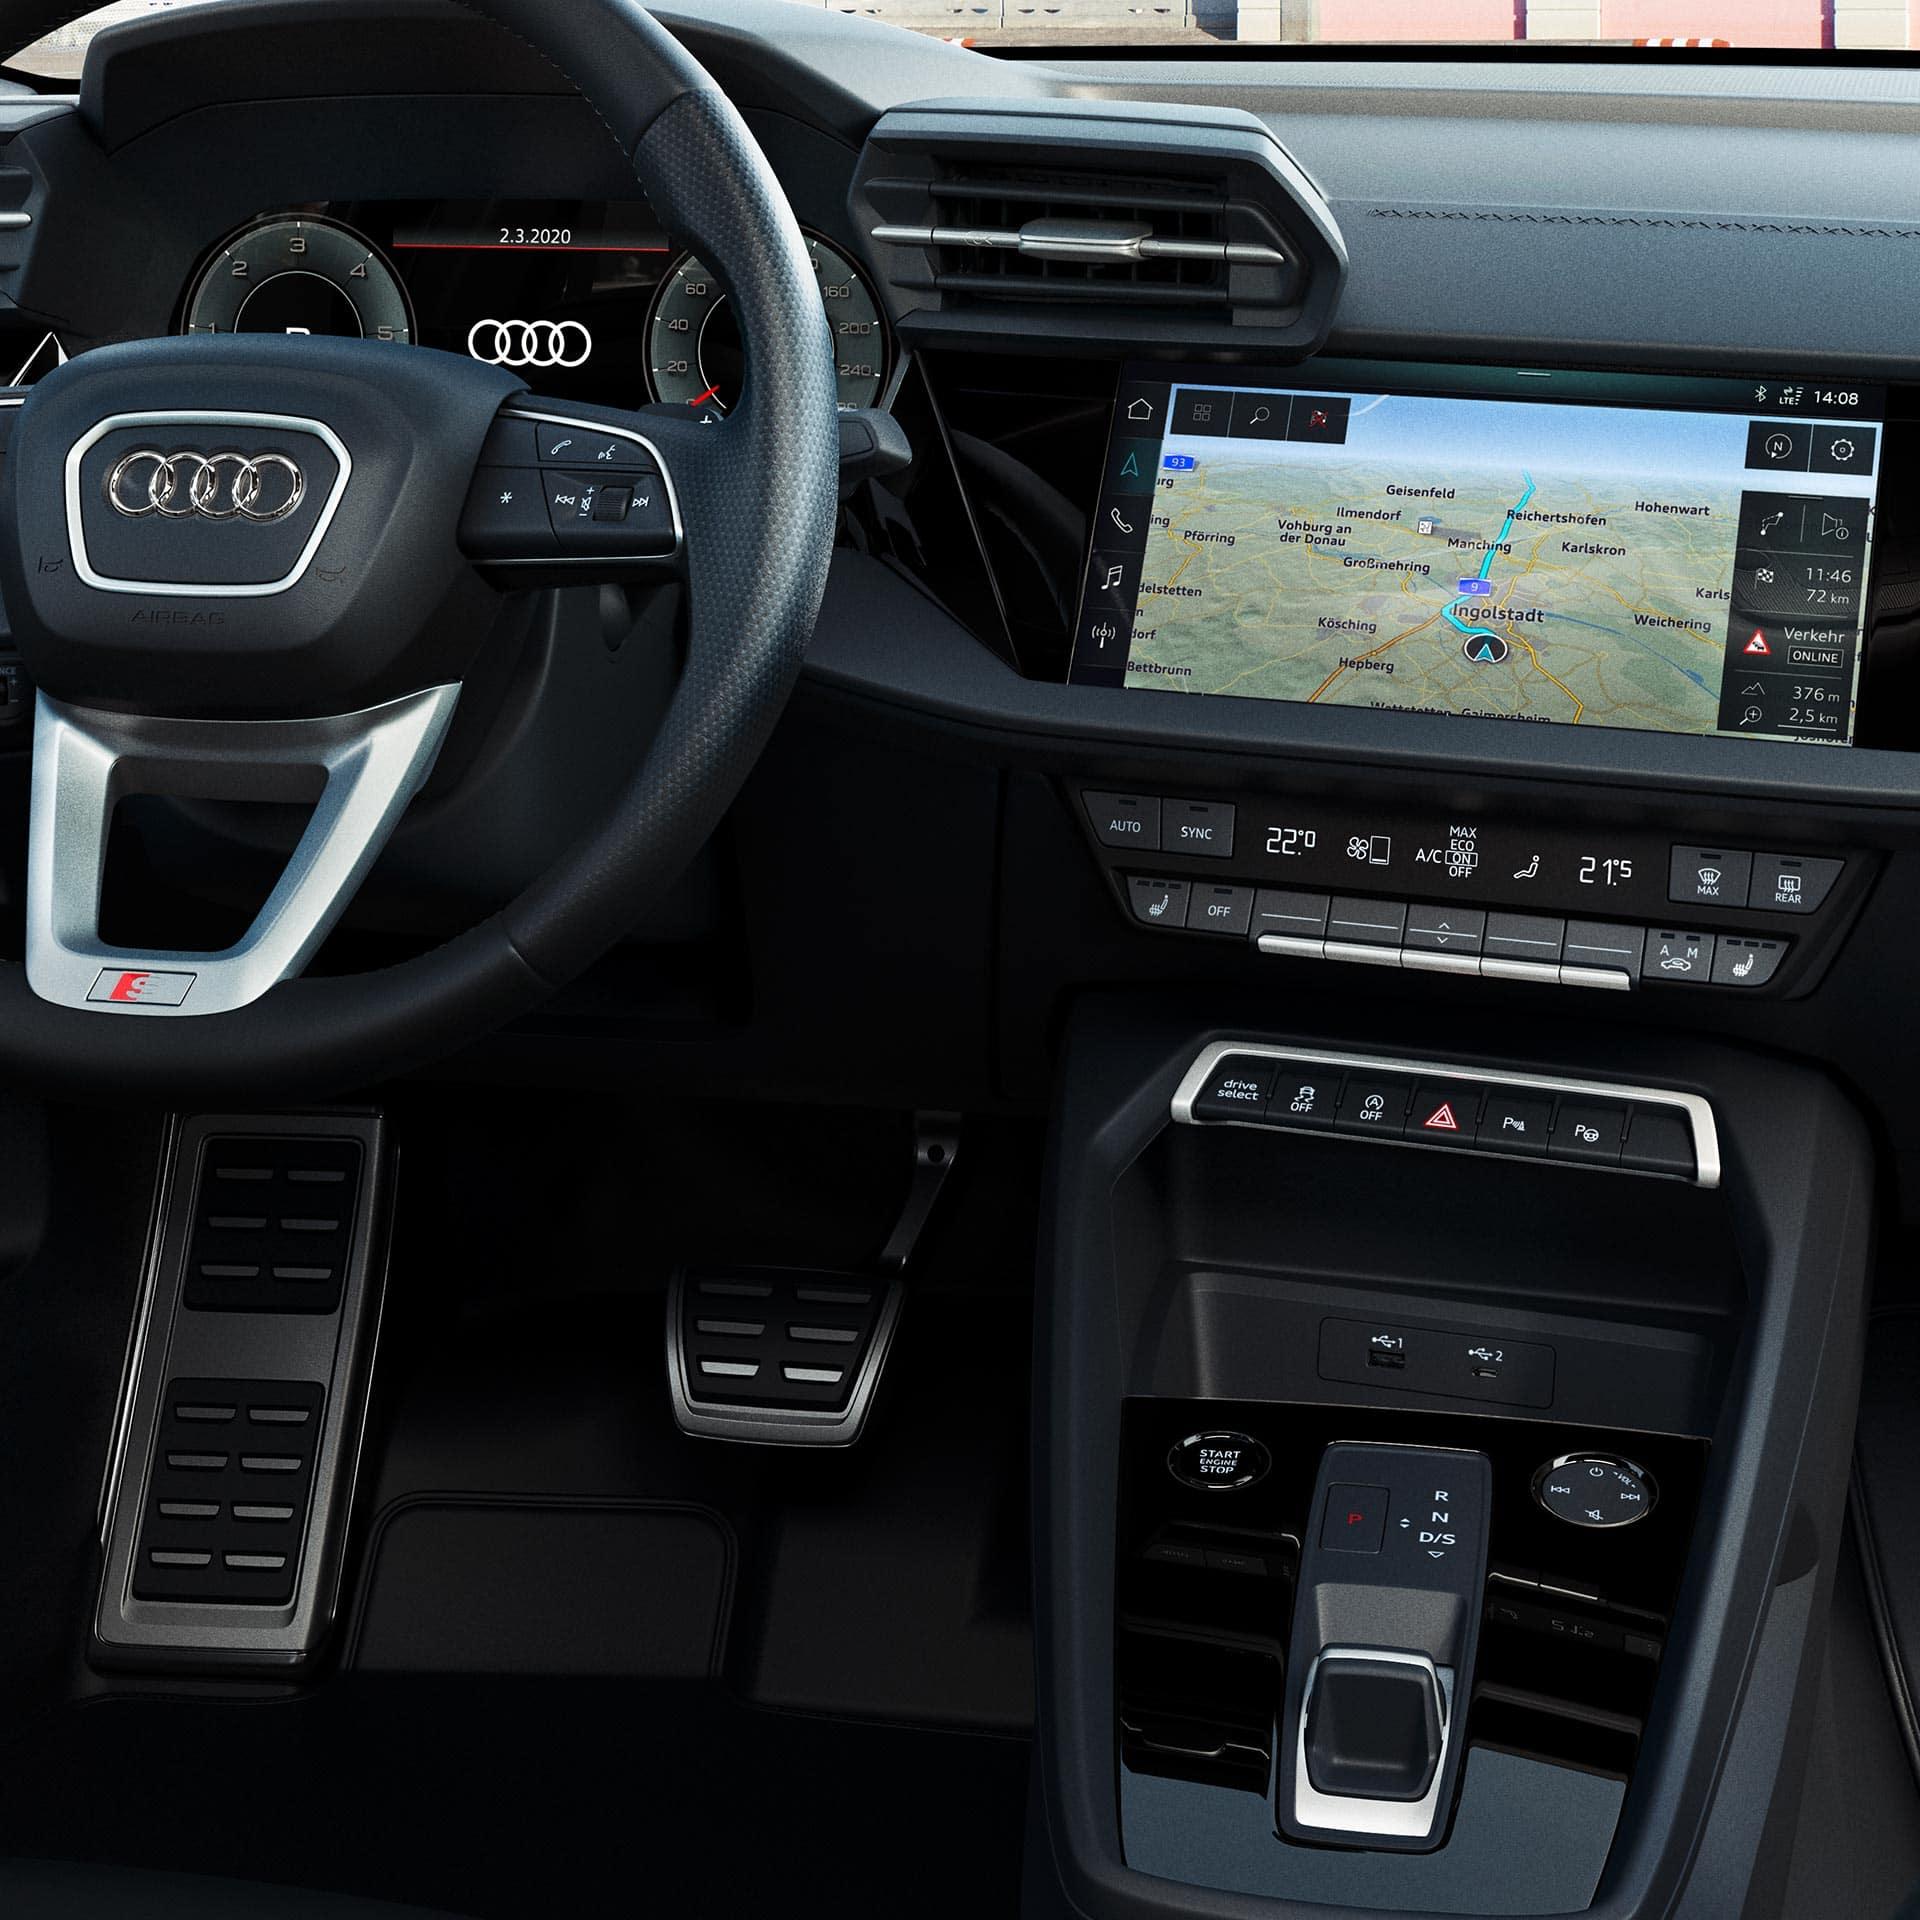 Nuova Audi A3 Sportback Baiauto